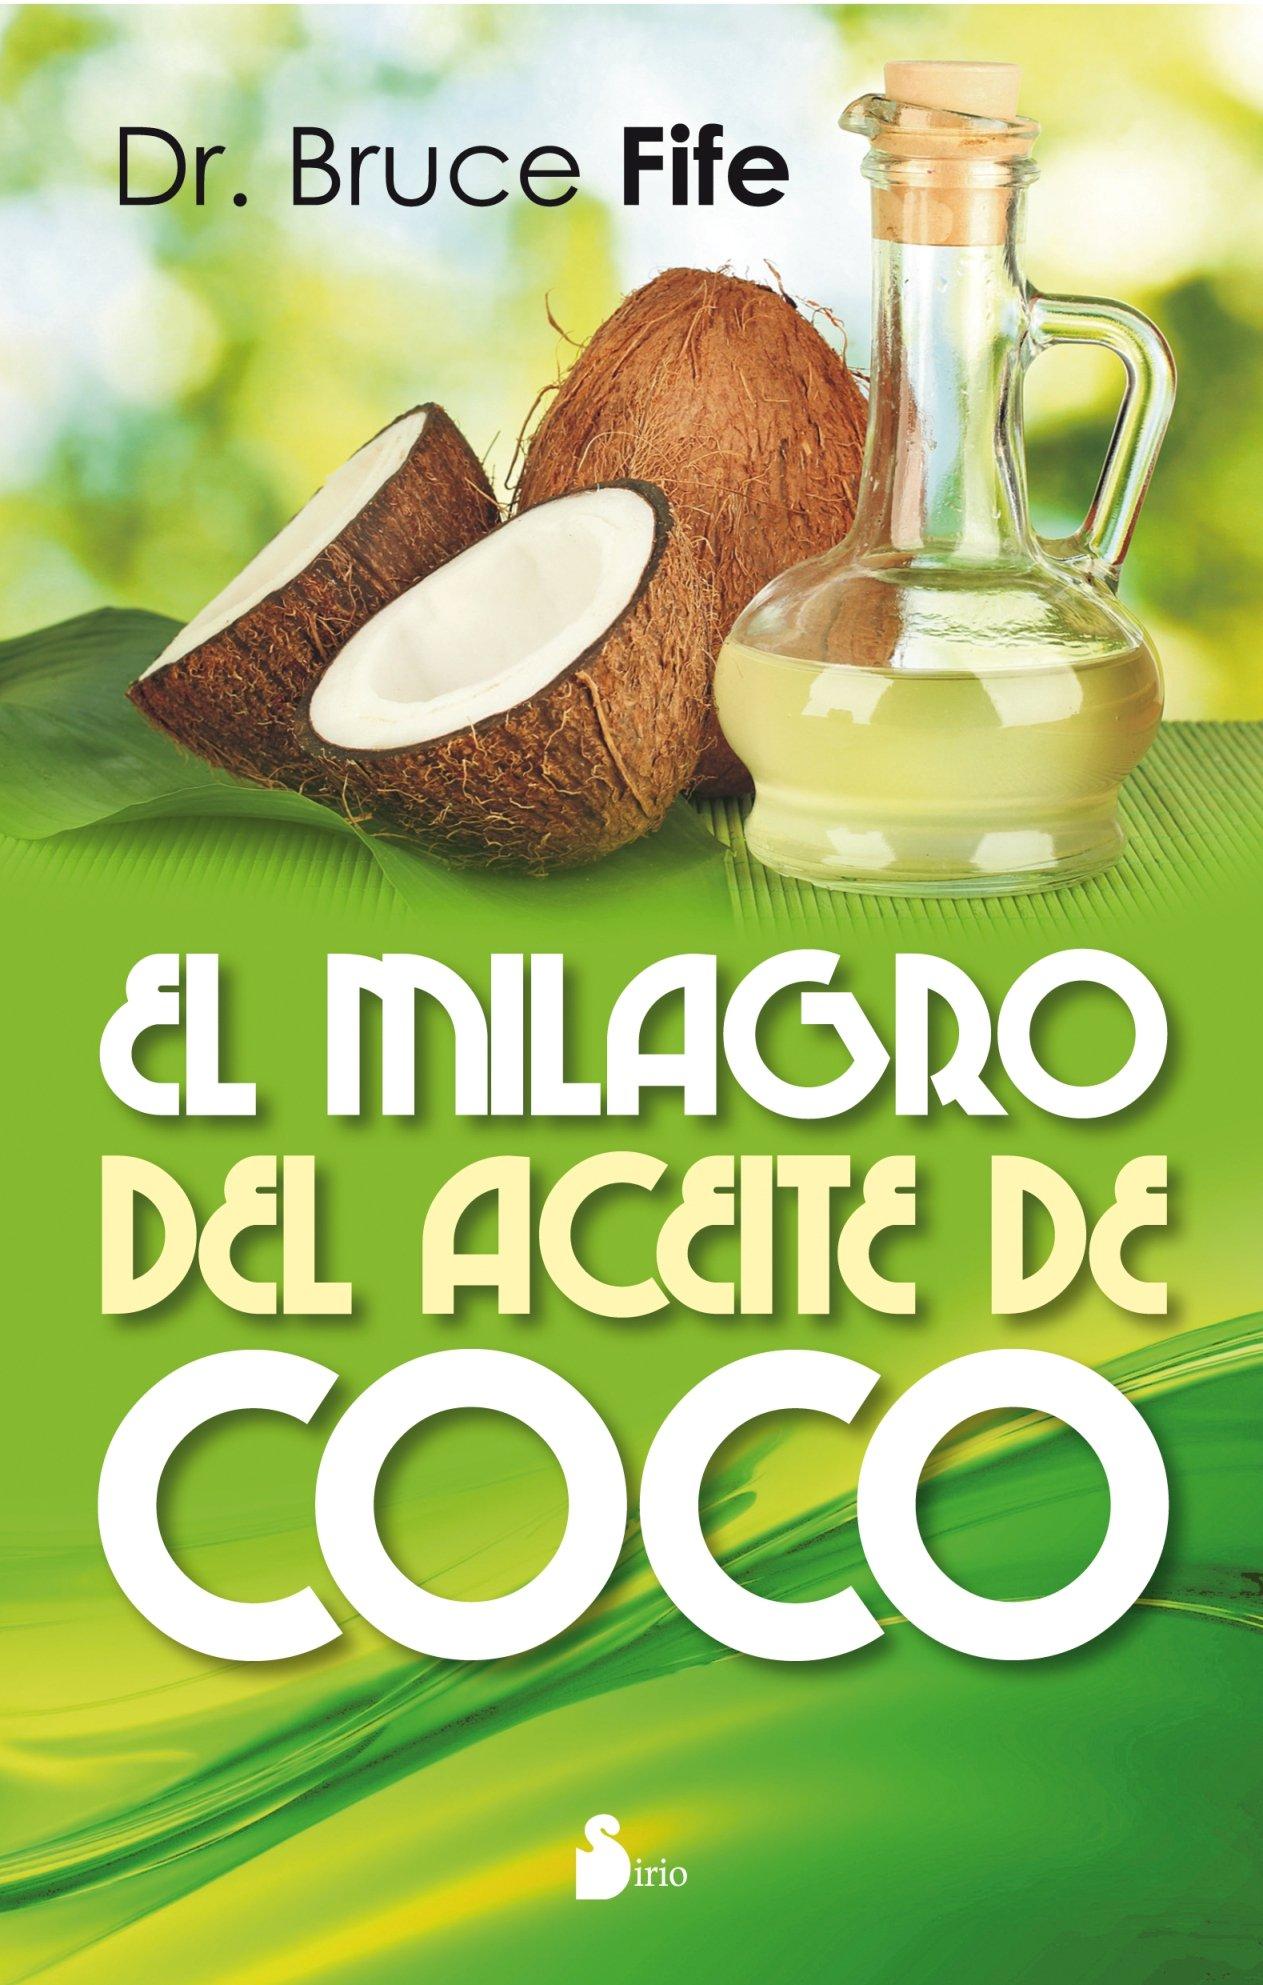 milagro del aceite coco Spanish product image